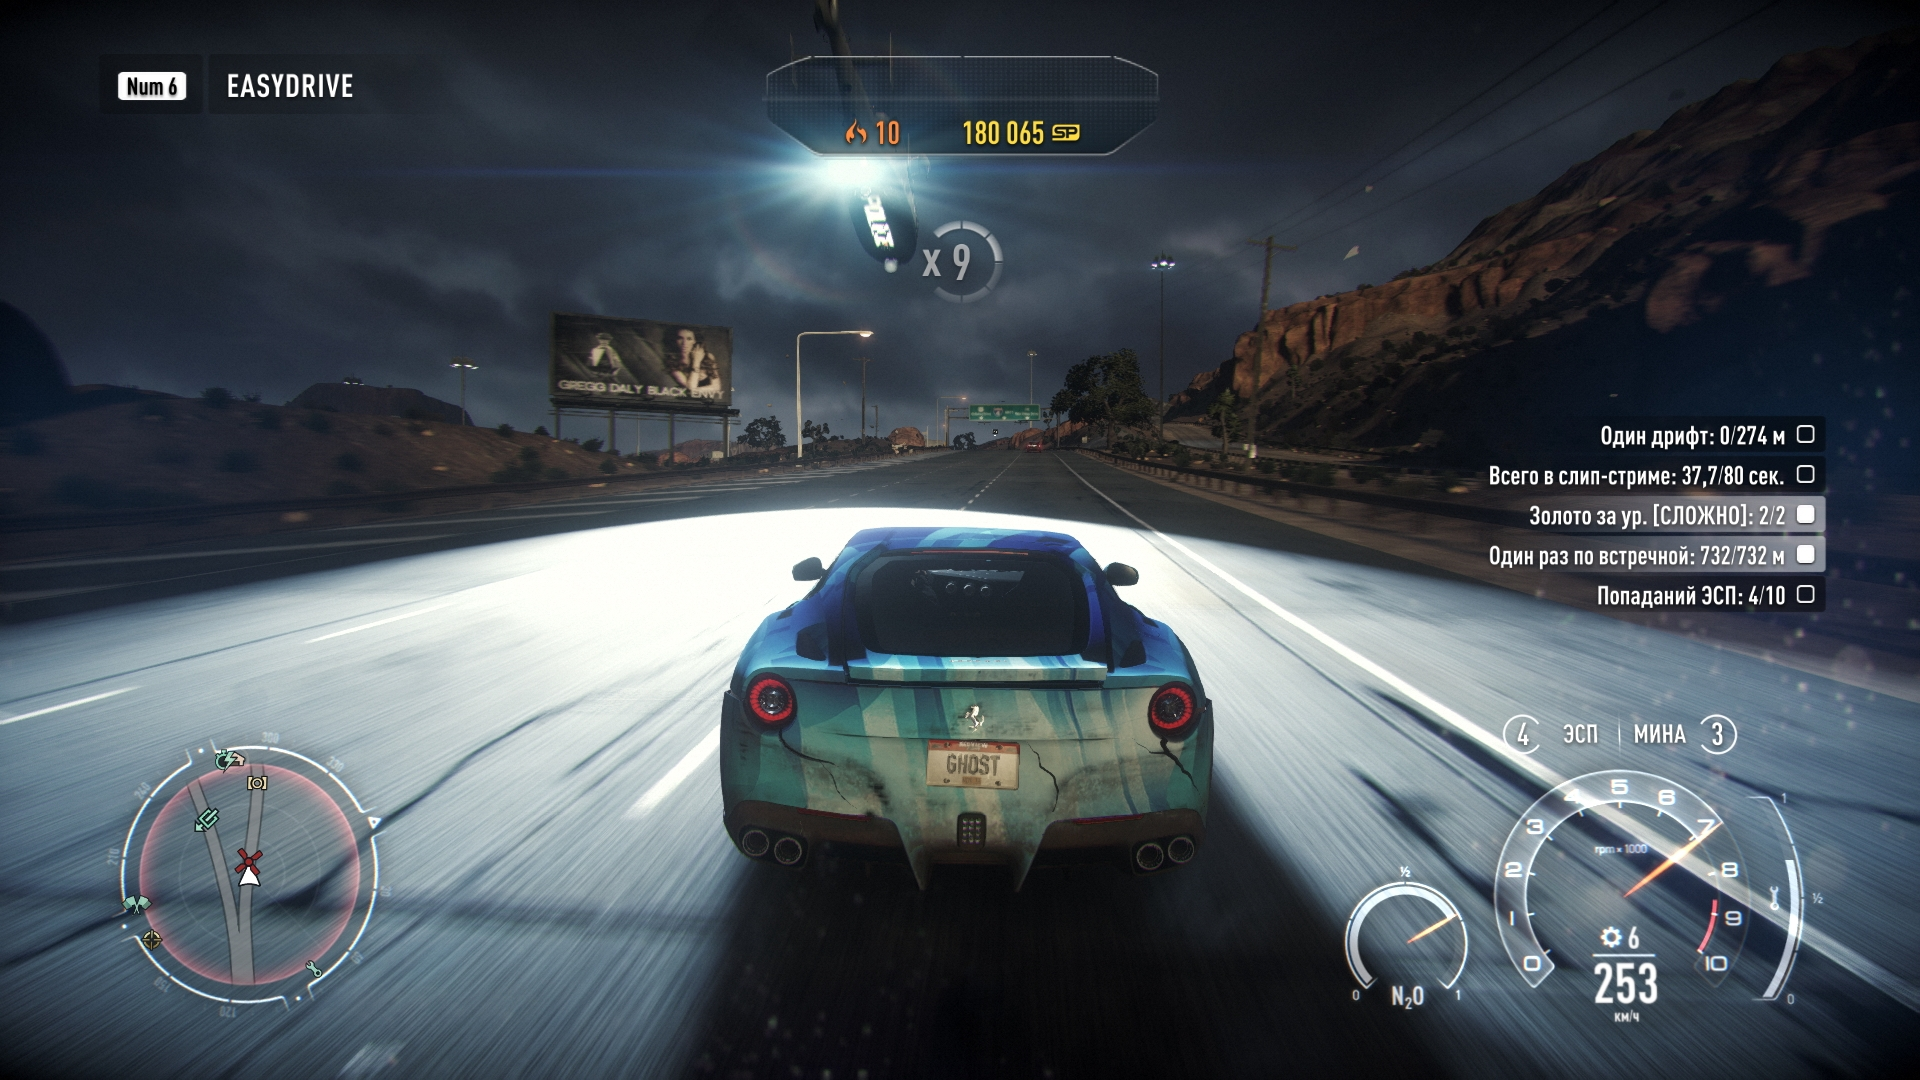 Как need for speed rivals сделать на русском на ps4